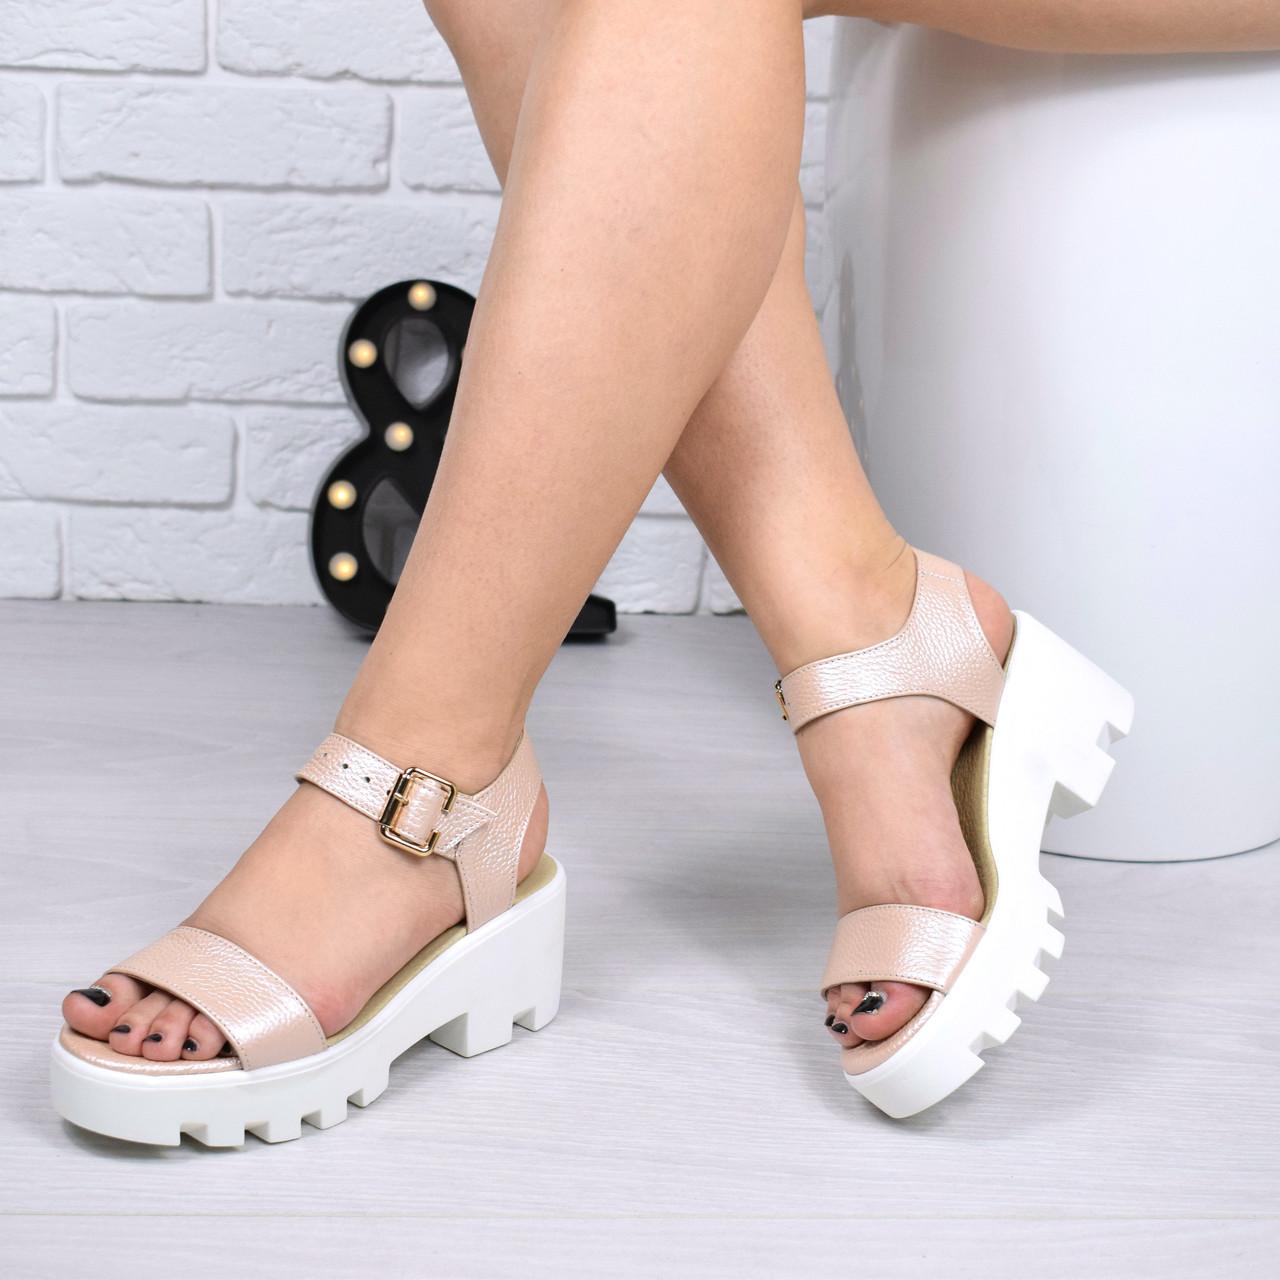 bba50590d80c Босоножки, туфли, сандали, сабо балетки, женские пудровые